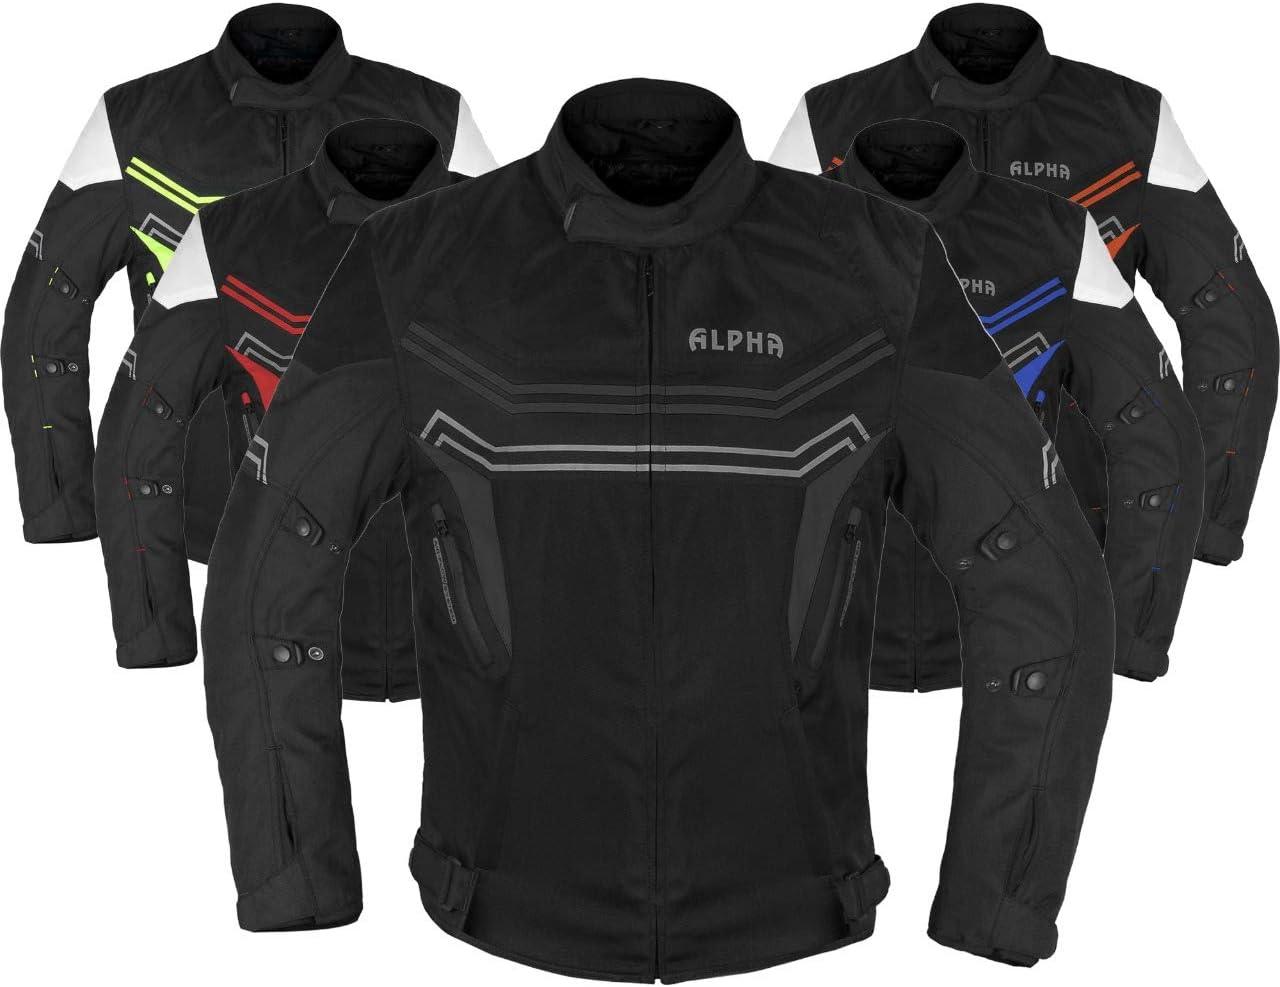 ALPHA CYCLE GEAR MOTORCYCLE ALL SEASON JACKET (BLACK, LARGE): Automotive